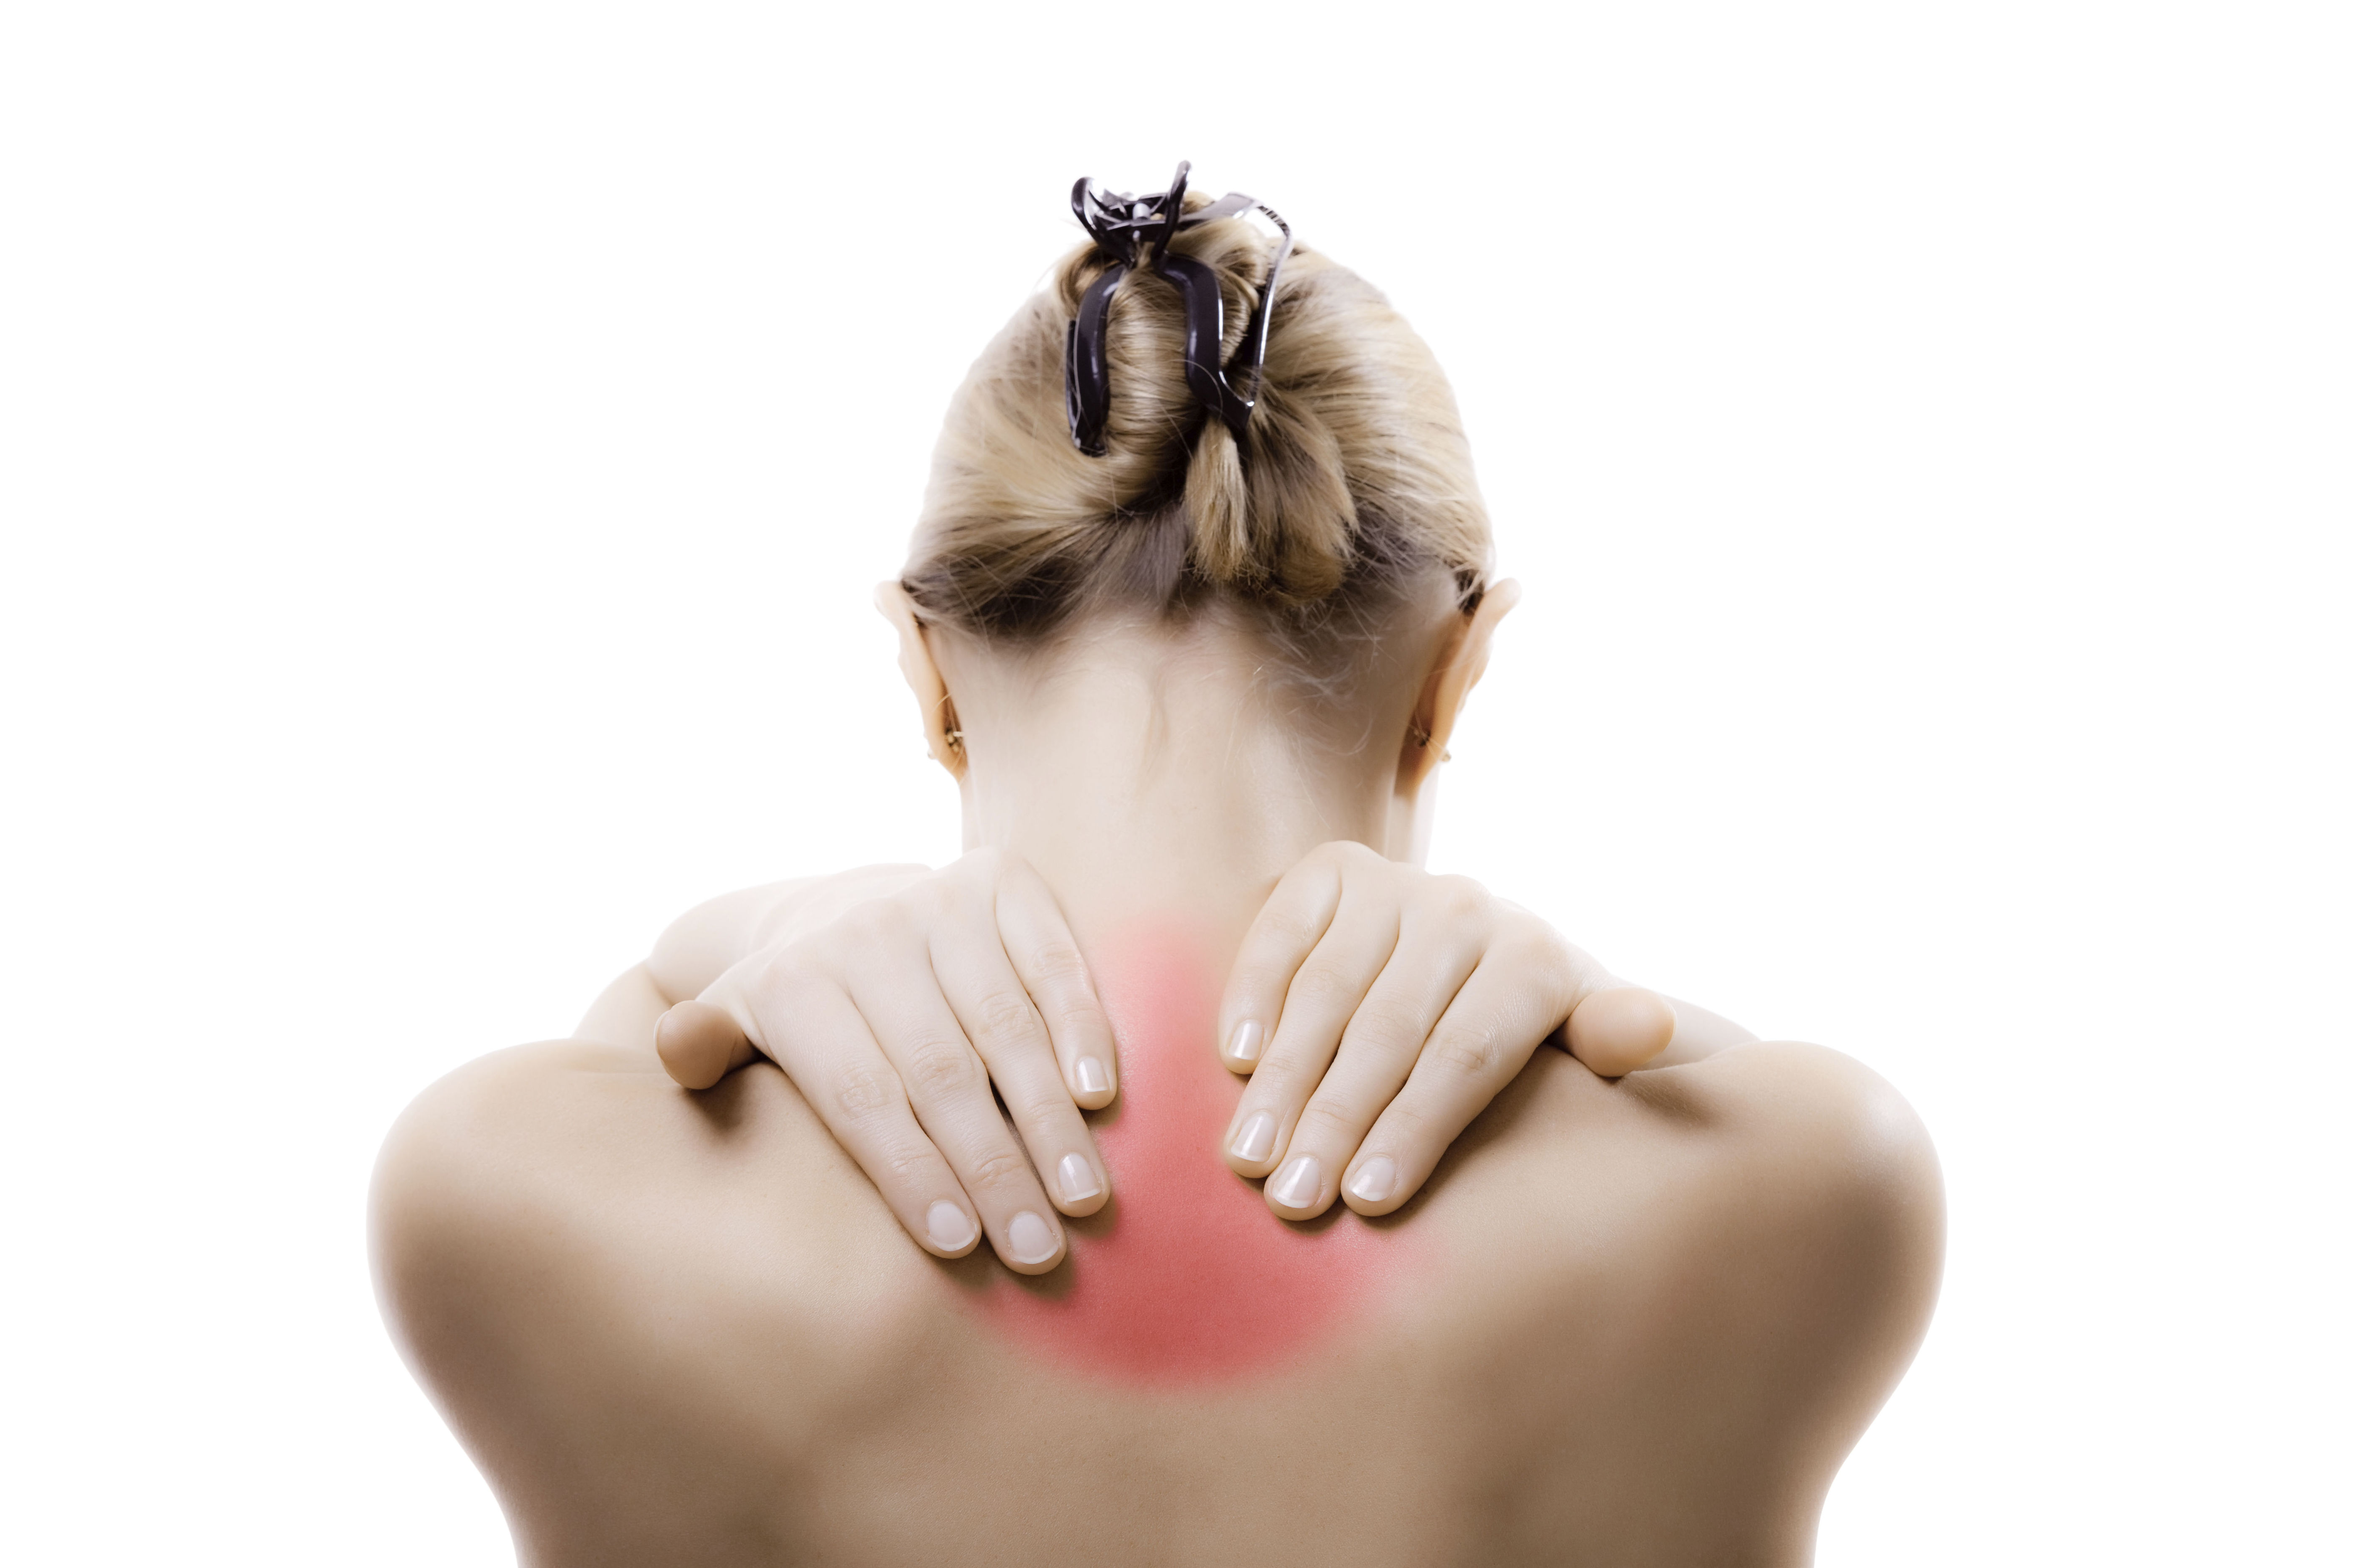 Recuperación de procesos degenerativos de tipo reumático, neurológico, traumatológico...